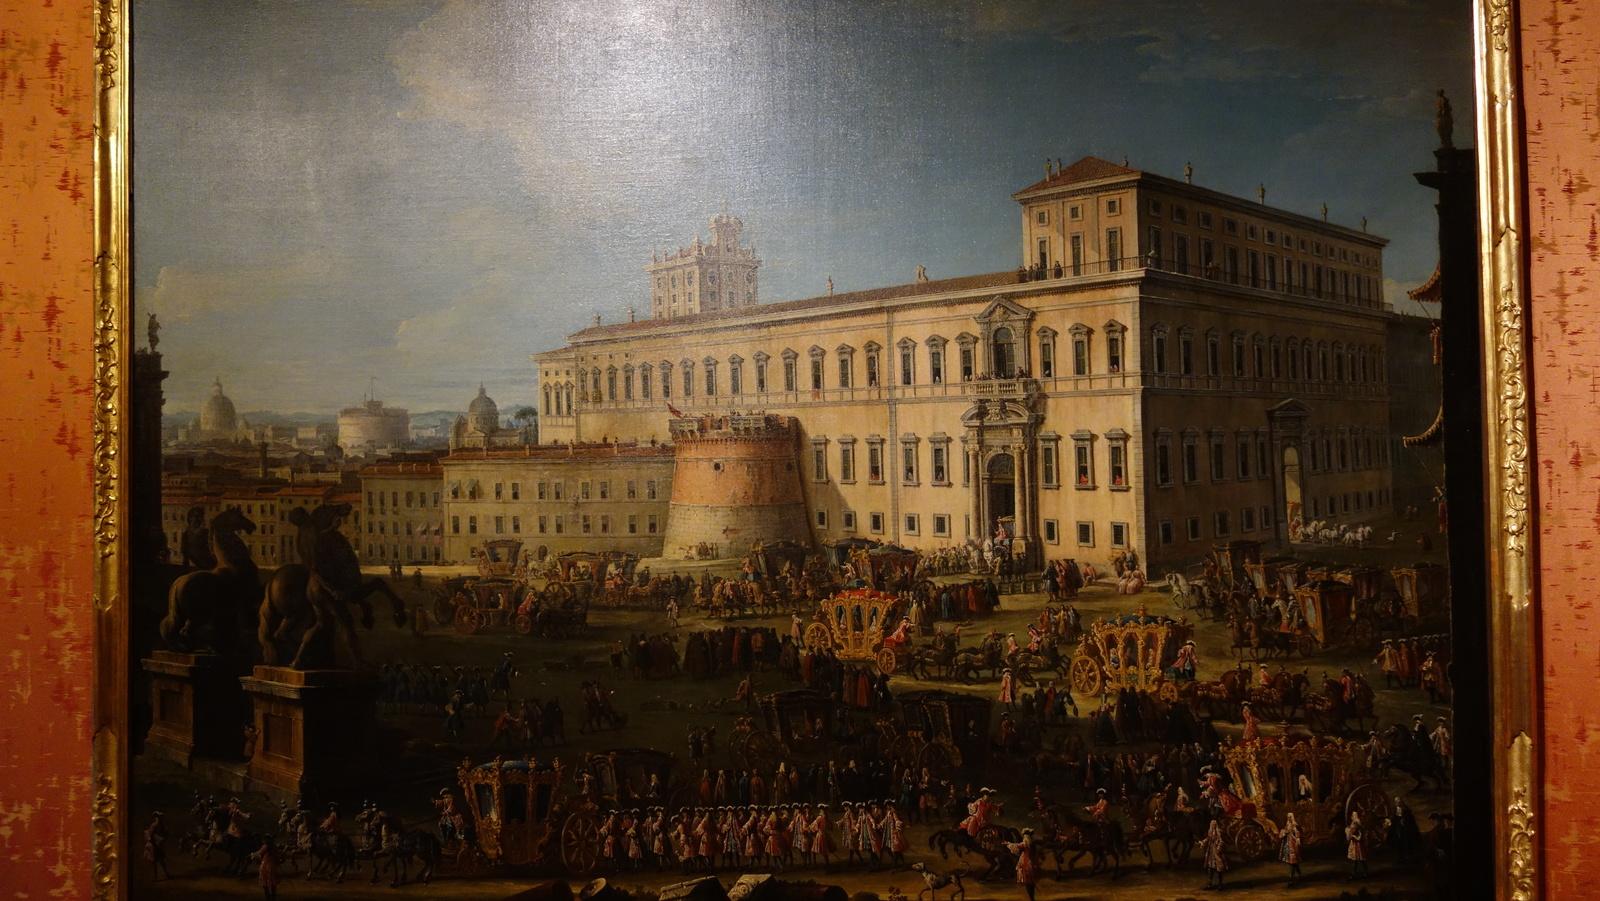 042 - Palazzo Mocenigo